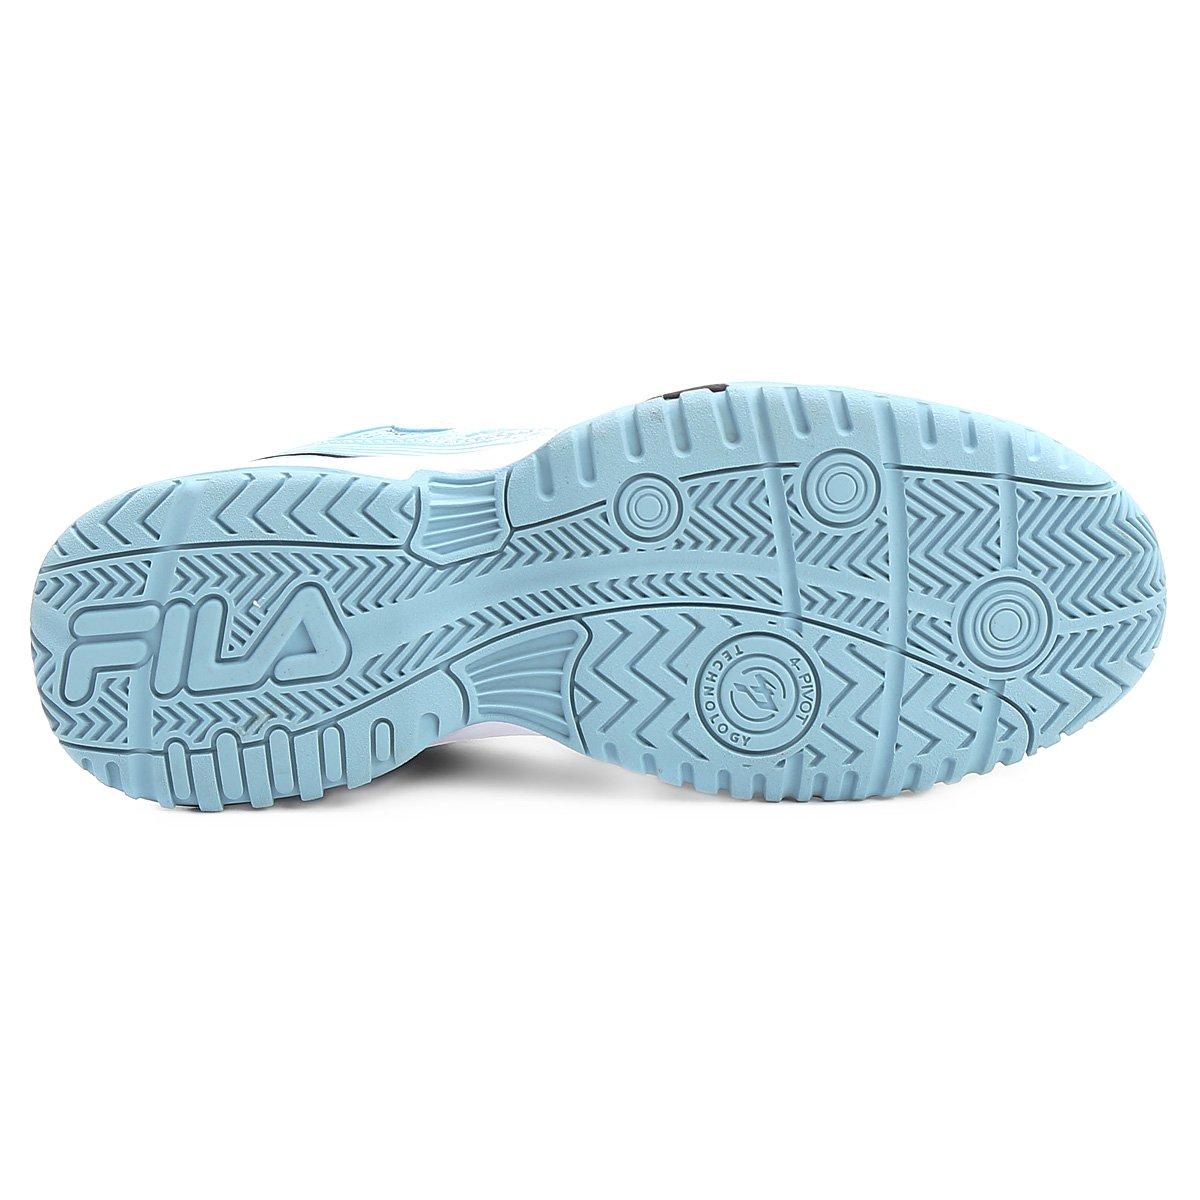 Tênis Tênis Top Fila Branco Azul Spin Top 2 Fila 2 e Spin 0 twxTFIOqq6